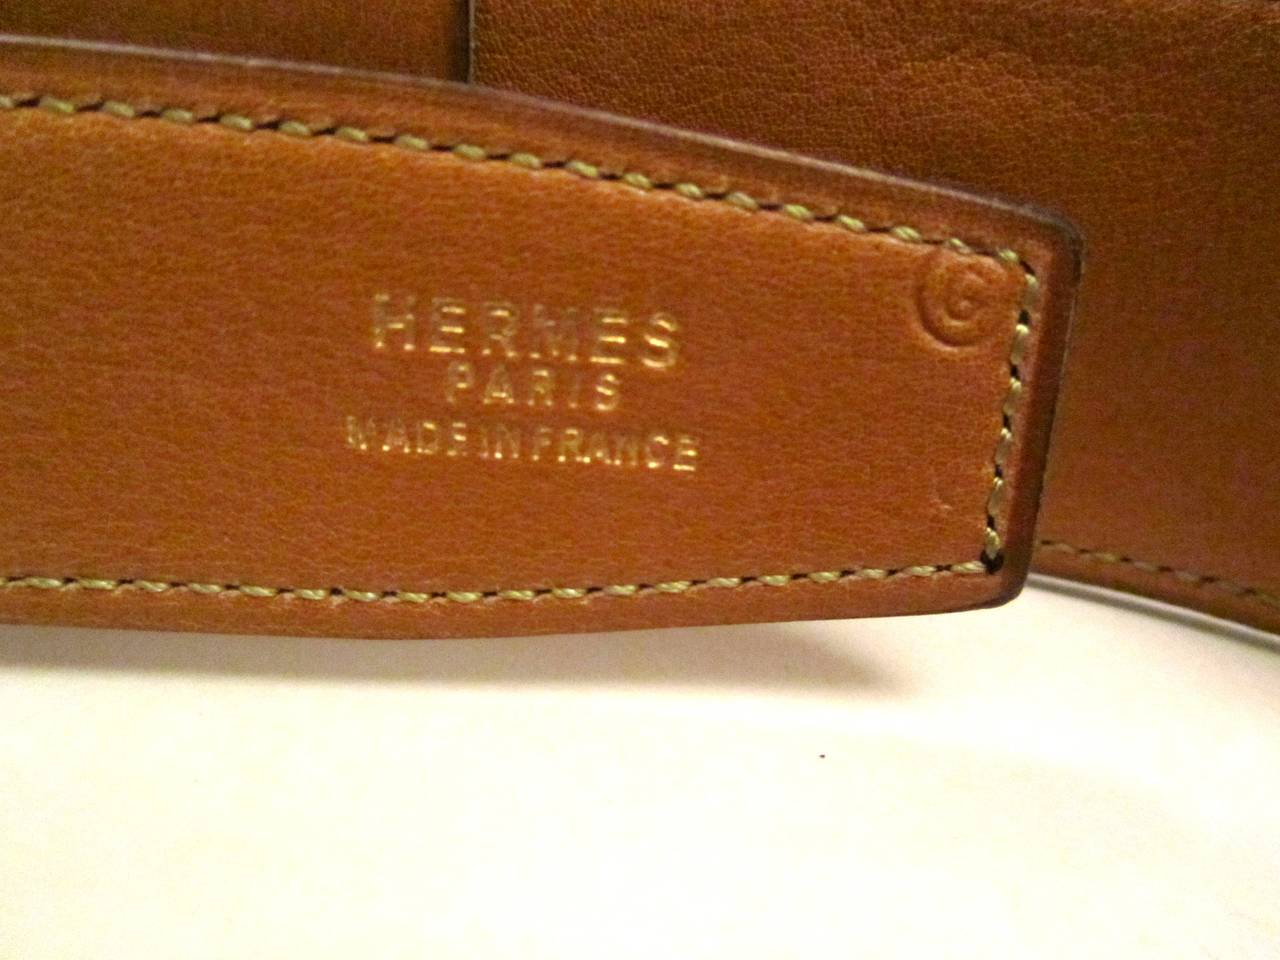 Hermes Kelly Belt - Adjustable 60 - 65 - Brown 4